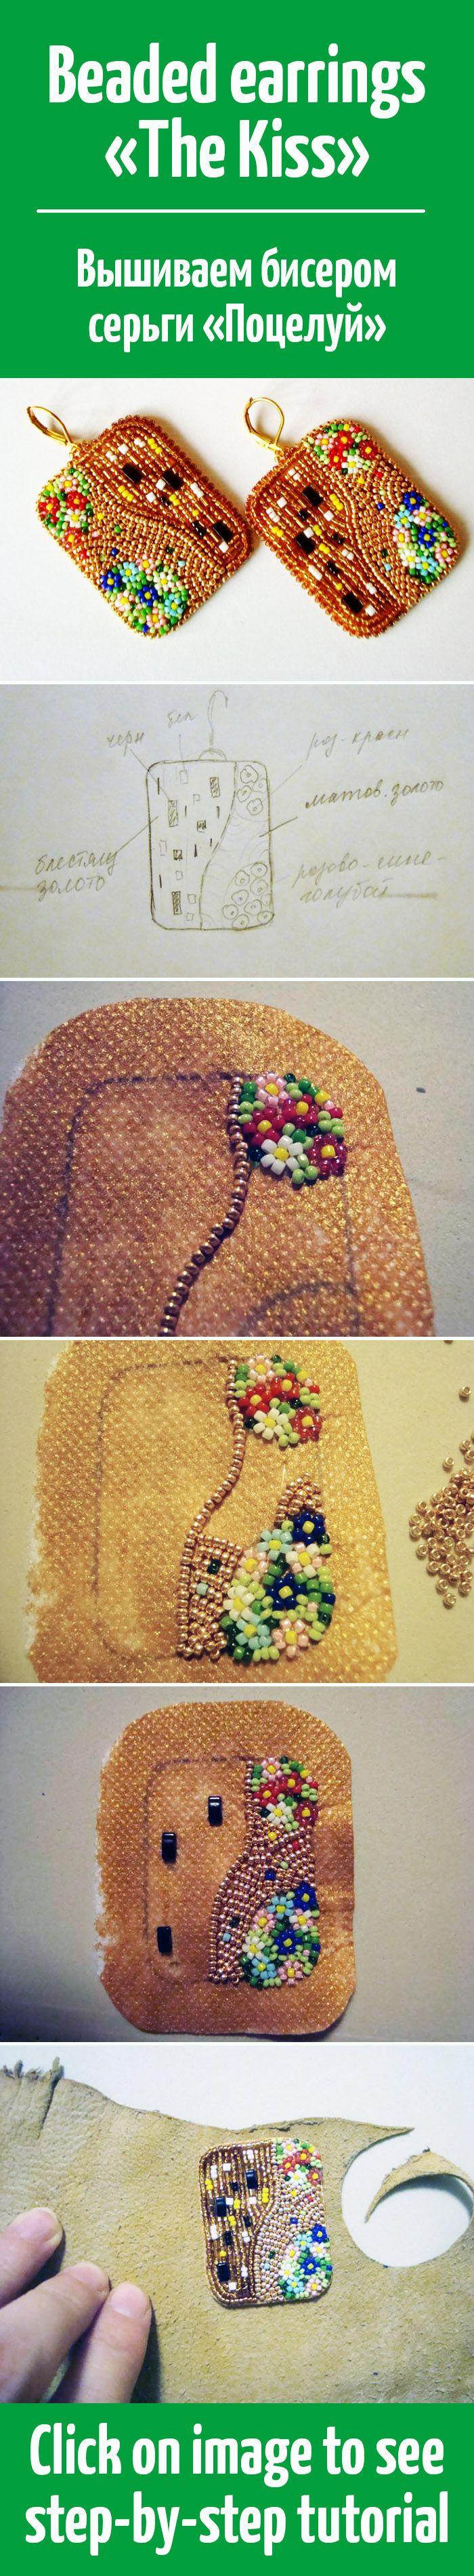 Вышиваем бисером серьги по мотивам картины Густава Климта «Поцелуй» / Beaded earrings tutotial